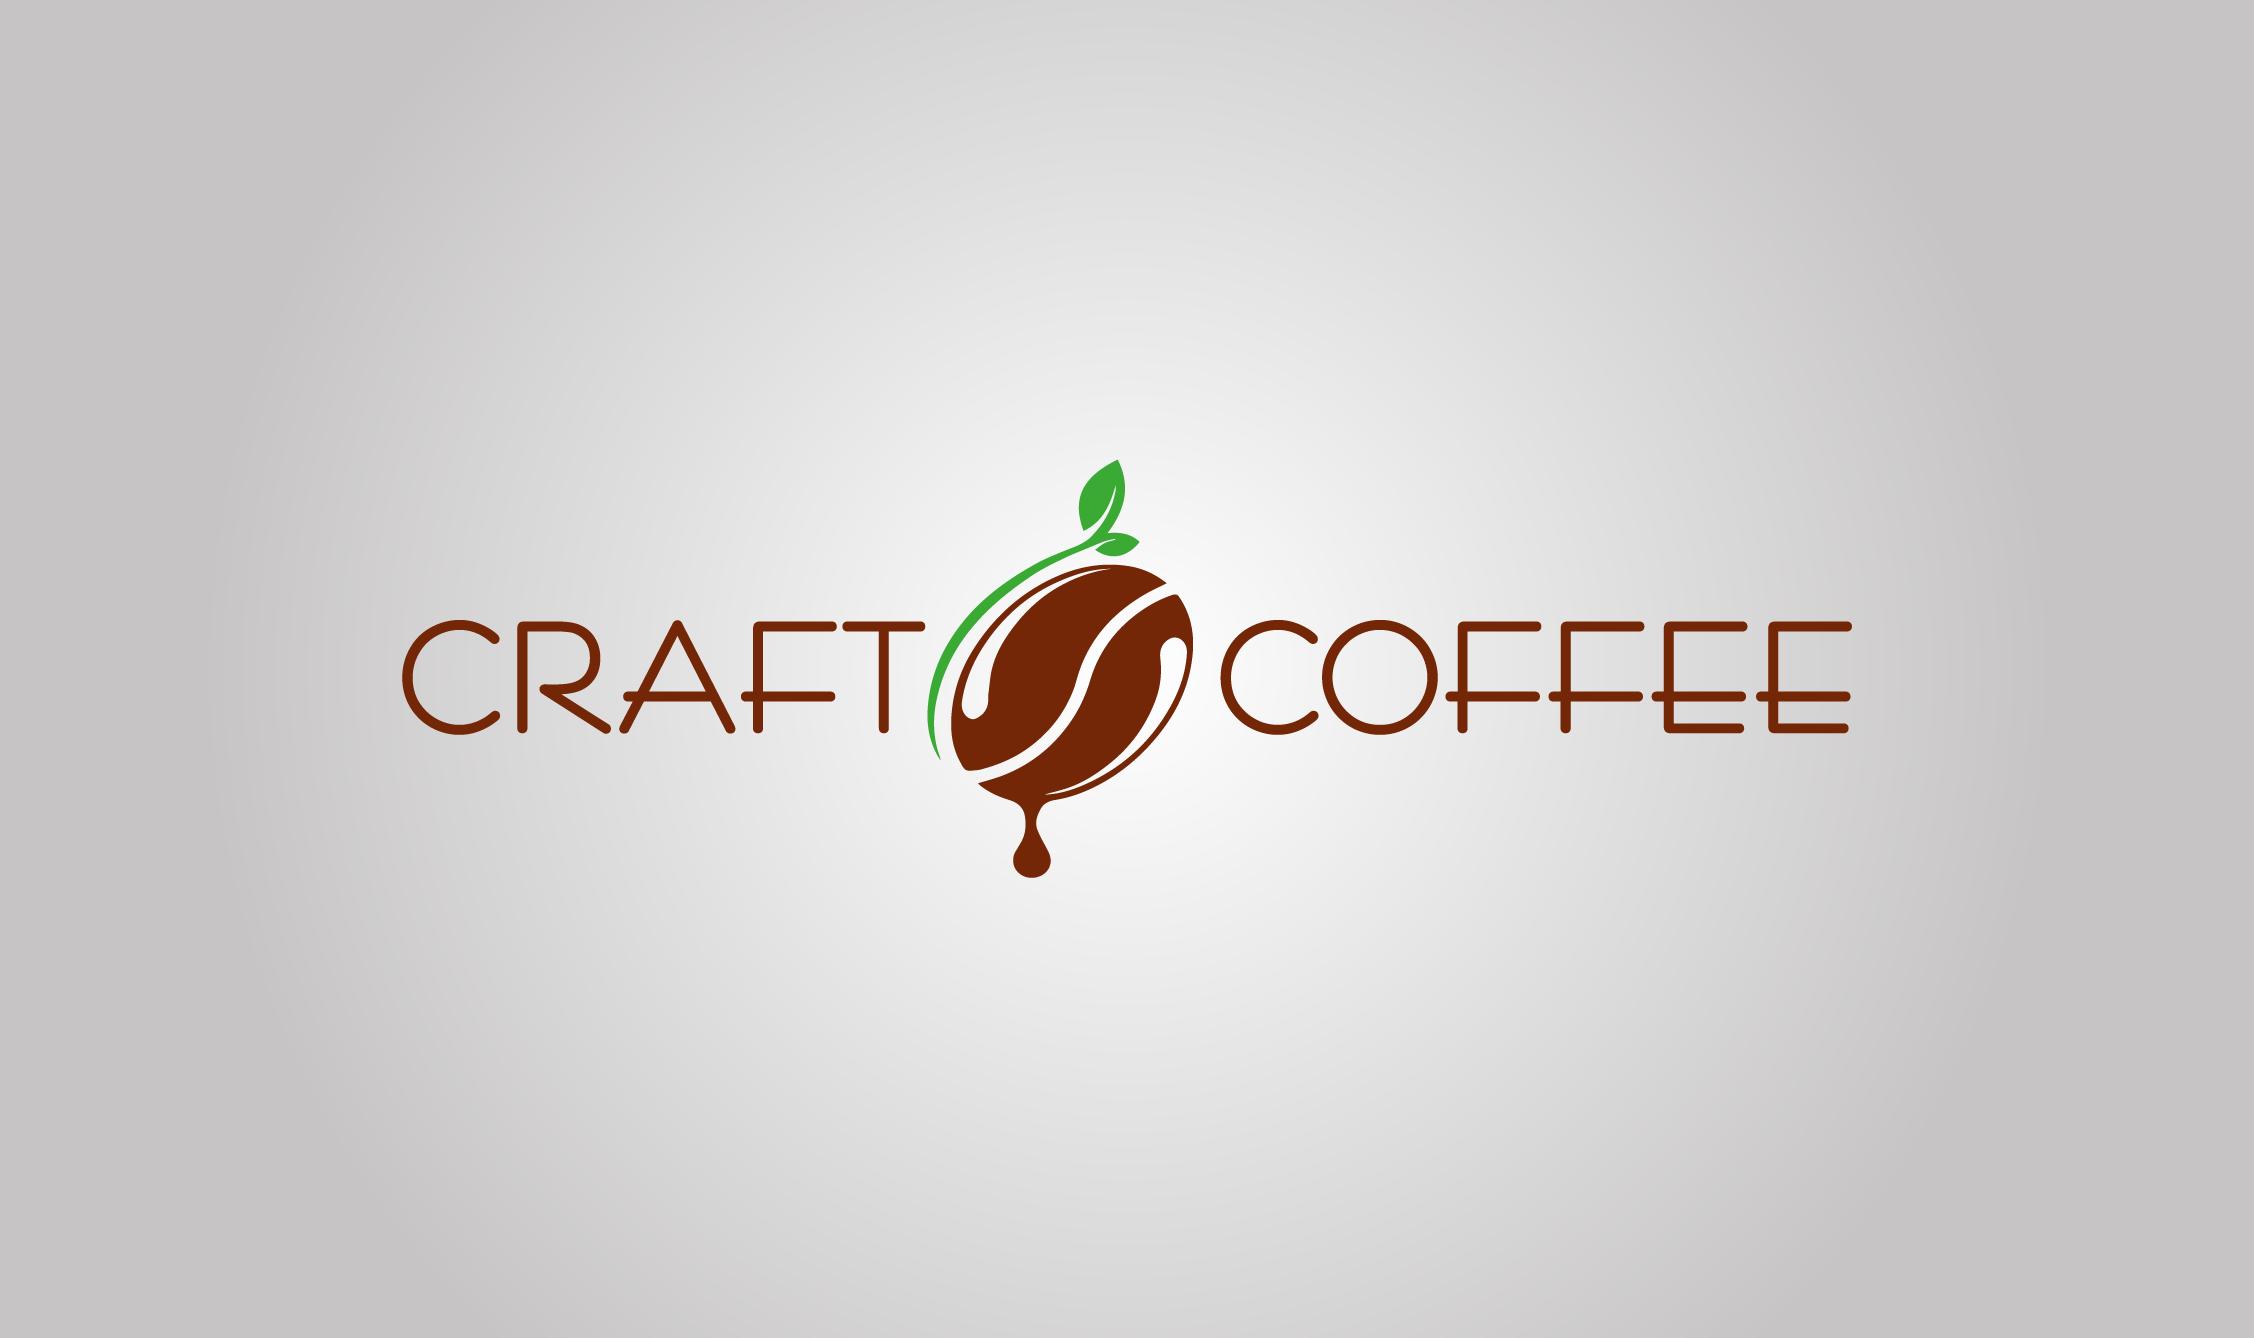 Логотип и фирменный стиль для компании COFFEE CULT фото f_8915bbb781b7e7b2.png